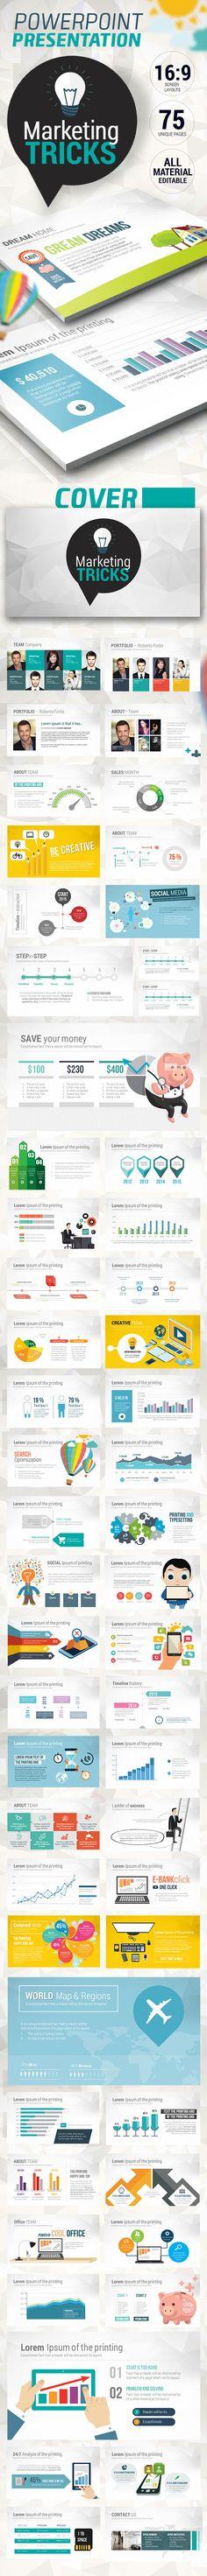 Fresh Marketing Tricks Presentation Template #powerpoint #powerpointtemplate Download: http://graphicriver.net/item/fresh-marketing-tricks-presentation/10440013?ref=ksioks